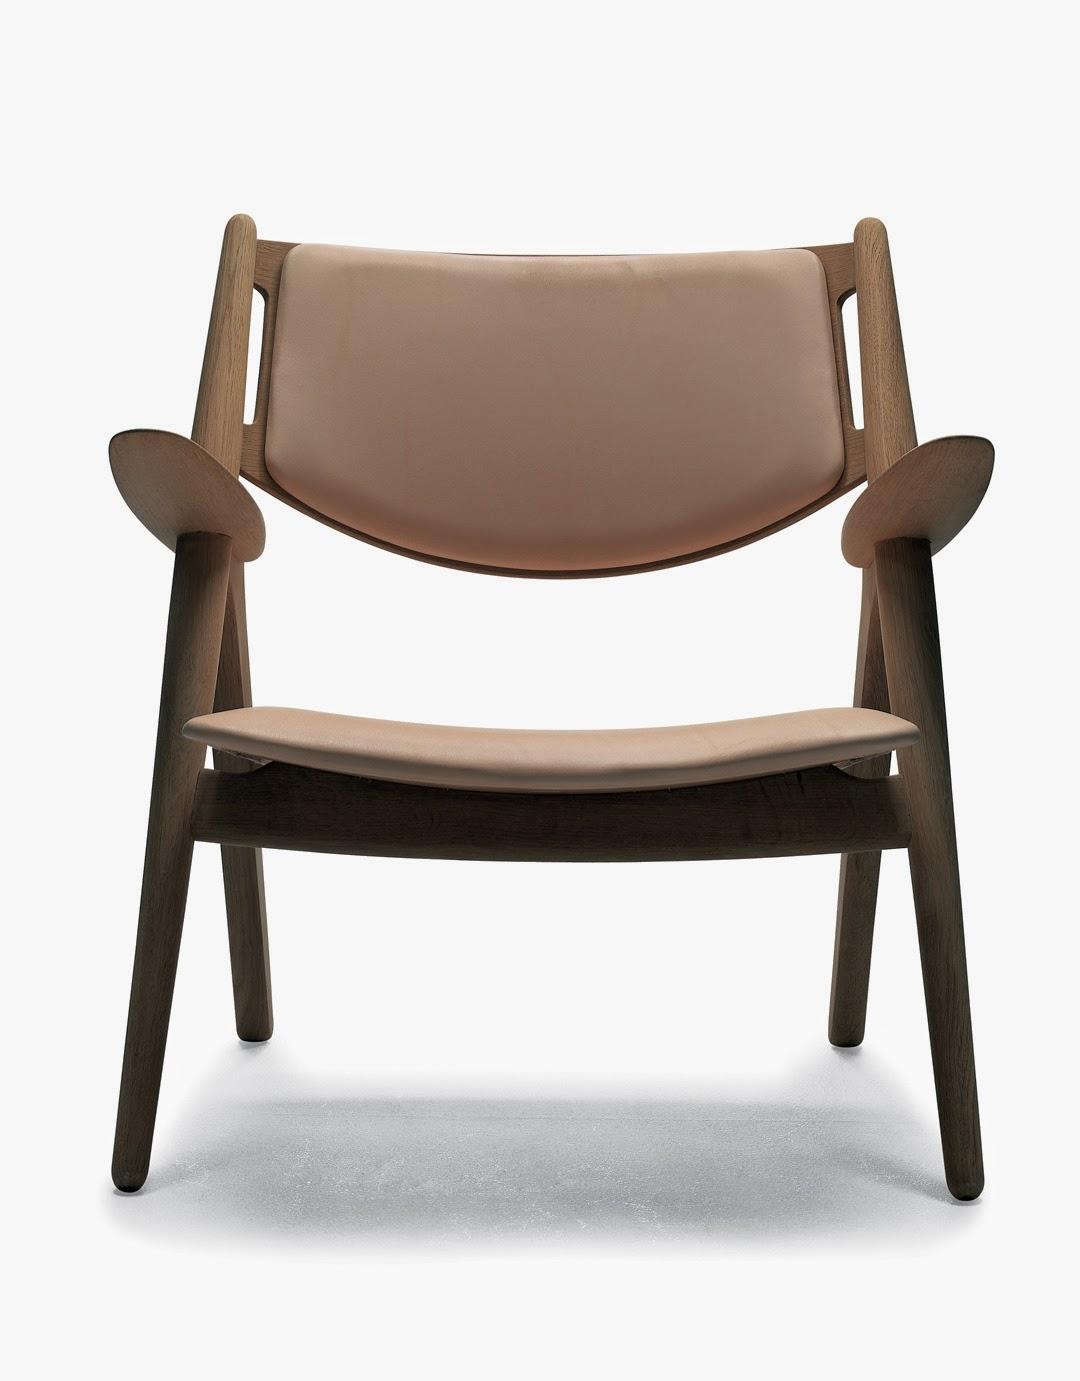 hans wegner sofa ch163 nice montpellier sofascore helsinki design: 100 jahre j.